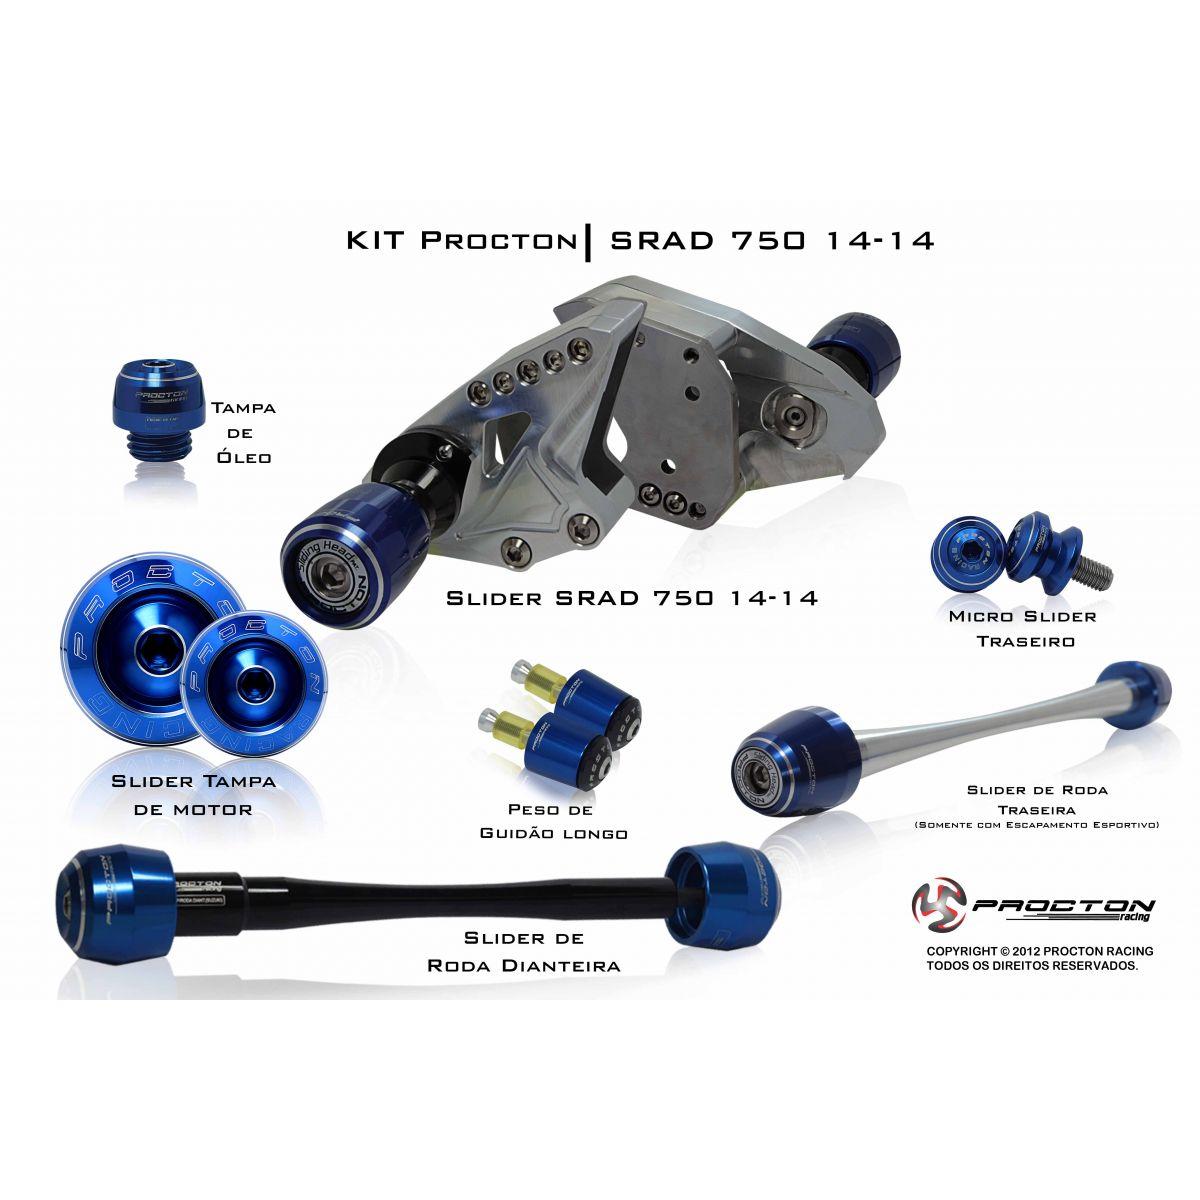 KIT Procton Suzuki SRAD750 07-13  - Nova Suzuki Motos e Acessórios